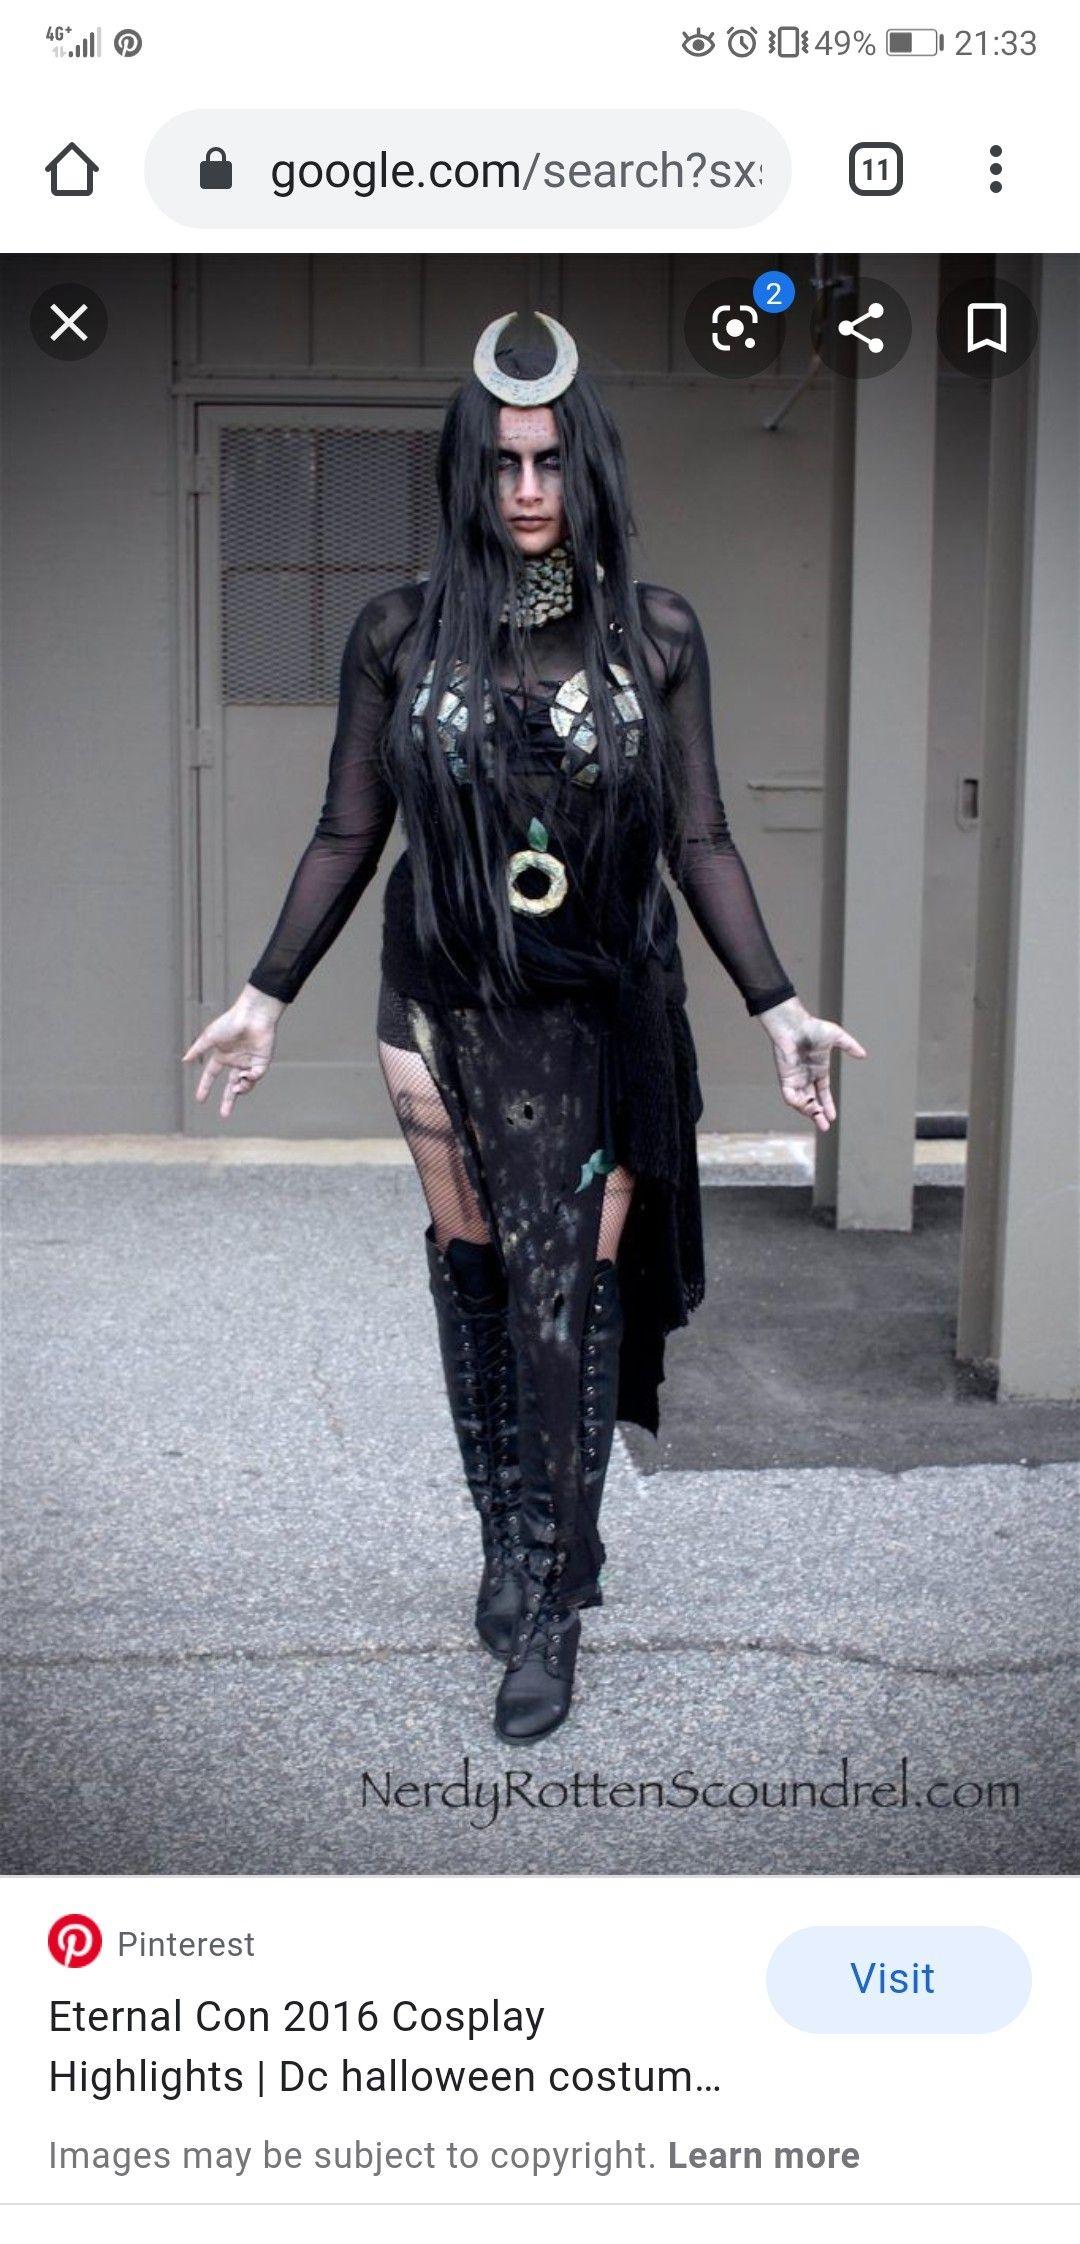 Dc Halloween Party 2020 Pin by Tasha Ironside on halloween in 2020 | Dc halloween costume